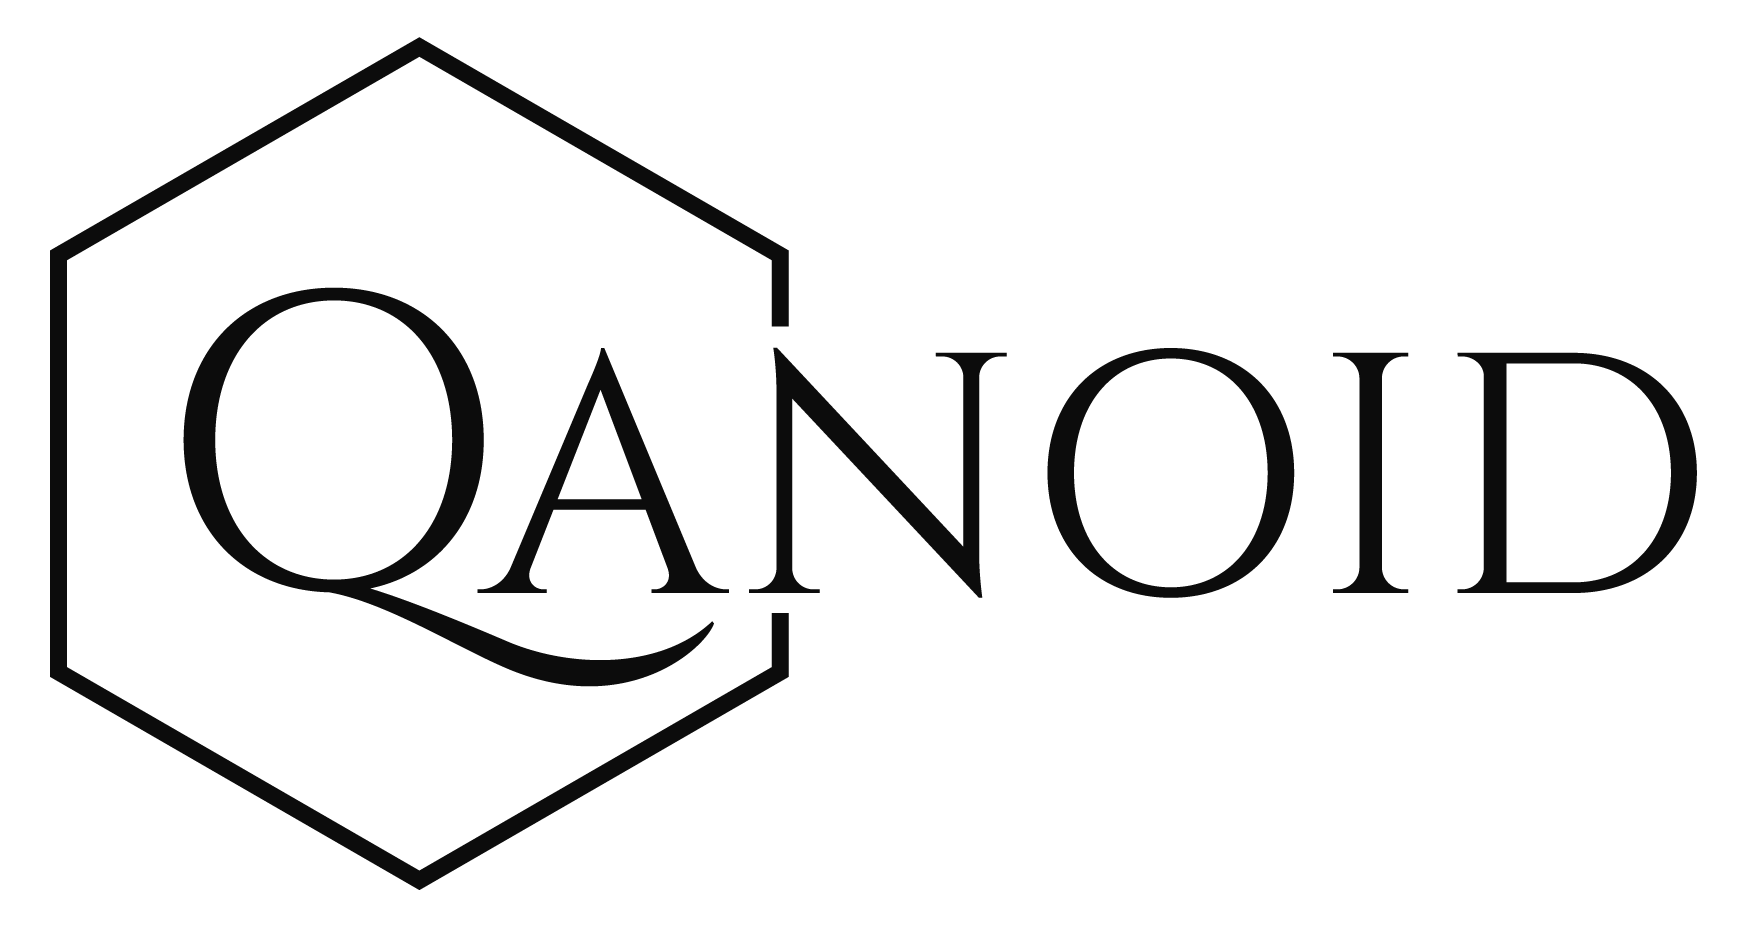 Qanoid